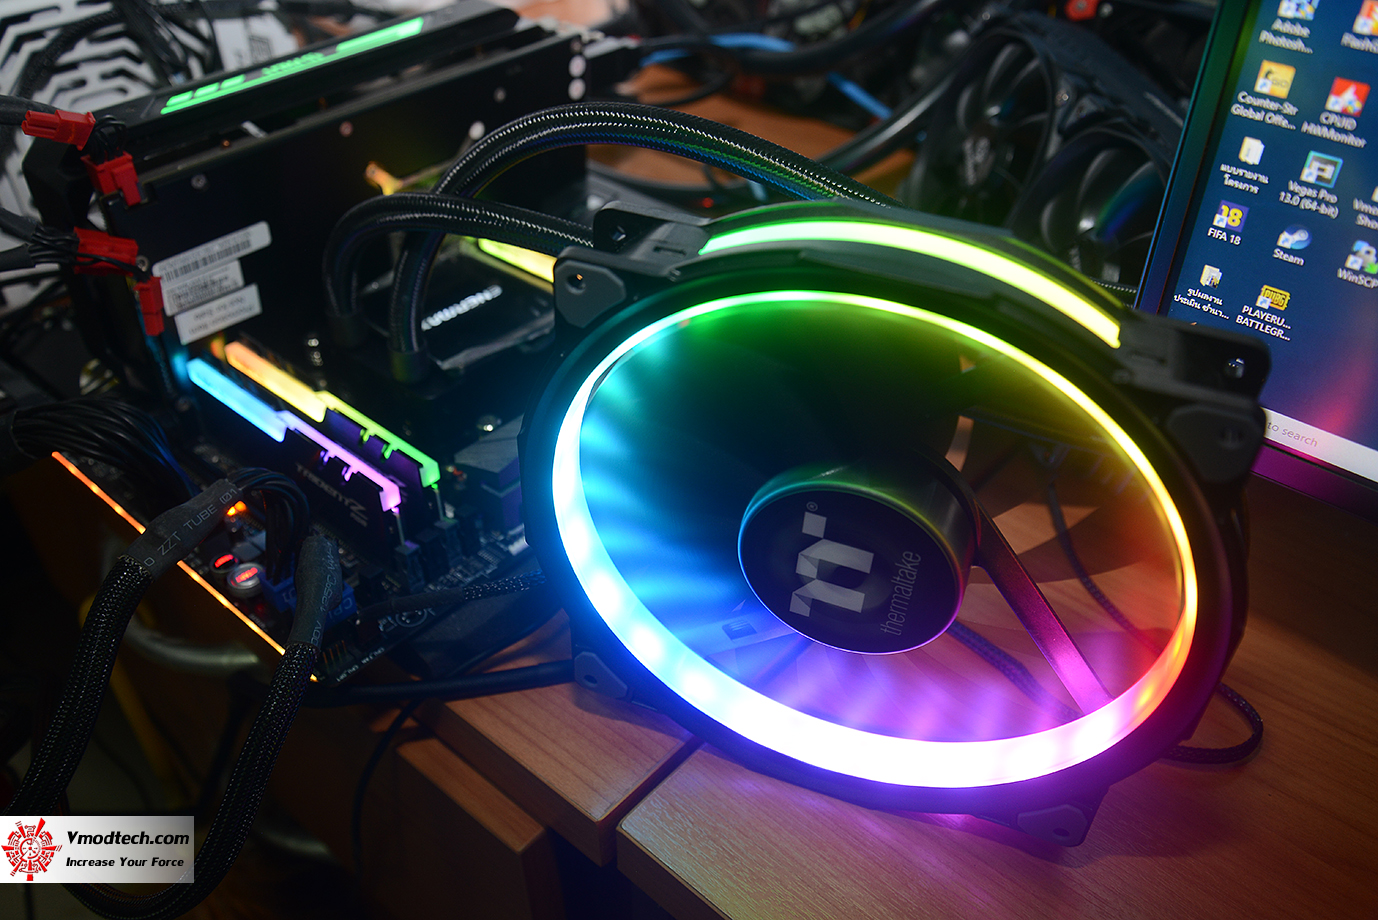 dsc 6636 Thermaltake Riing Plus 20 RGB Case Fan TT Premium Edition (Single Fan Pack w/o Controller) Review